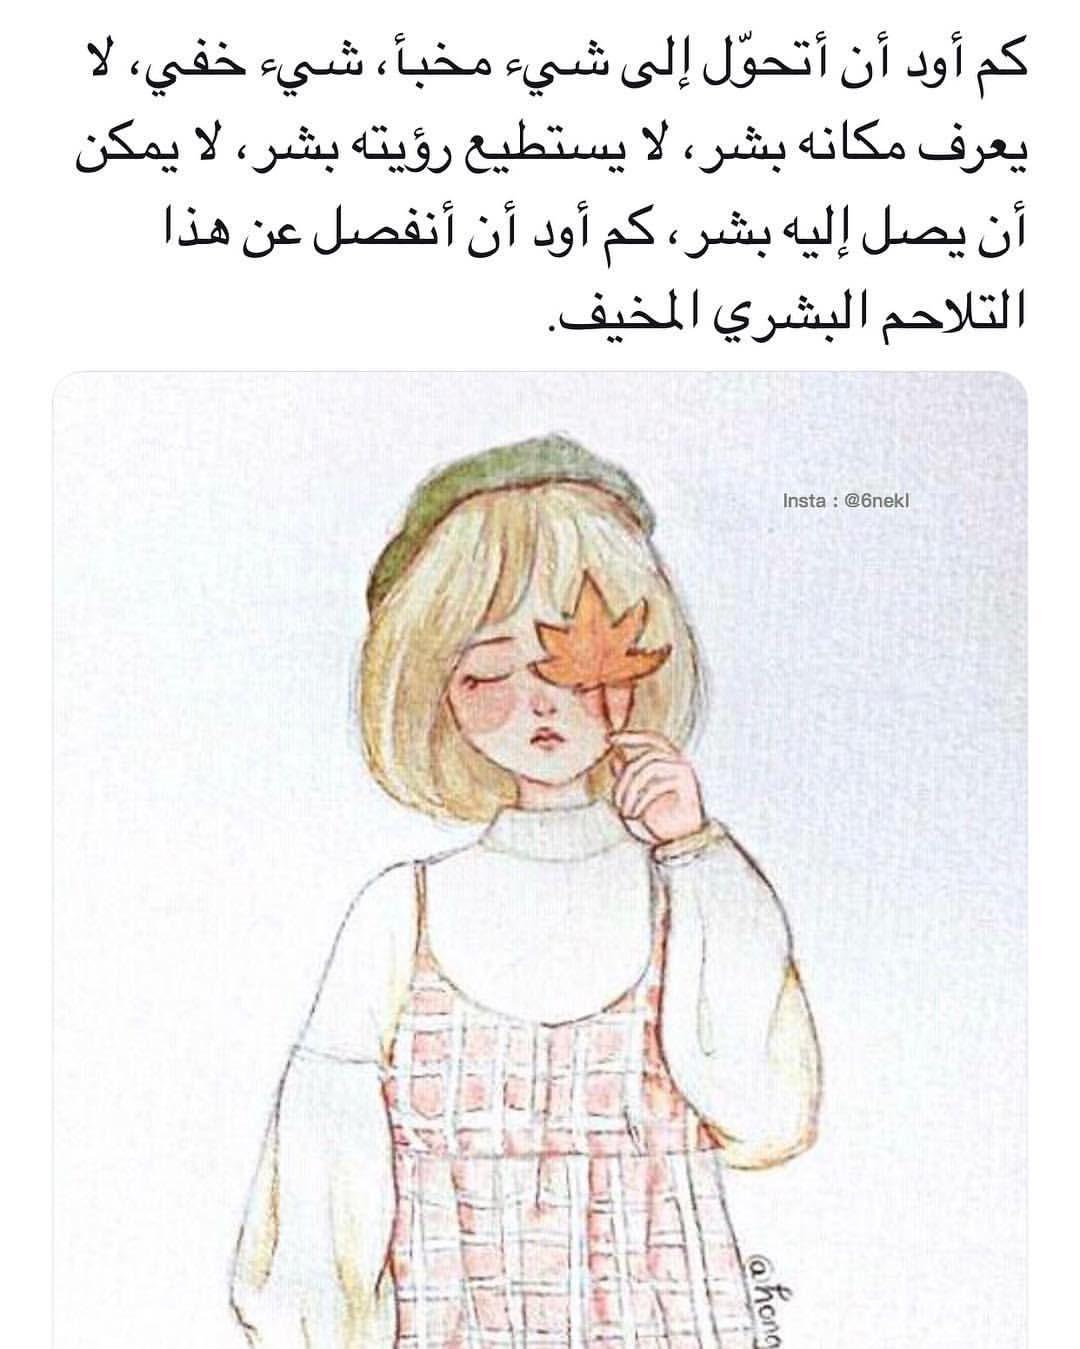 أنا فعلا احتاج الي عزله مؤقته Quotes For Book Lovers Arabic Quotes Funny Arabic Quotes